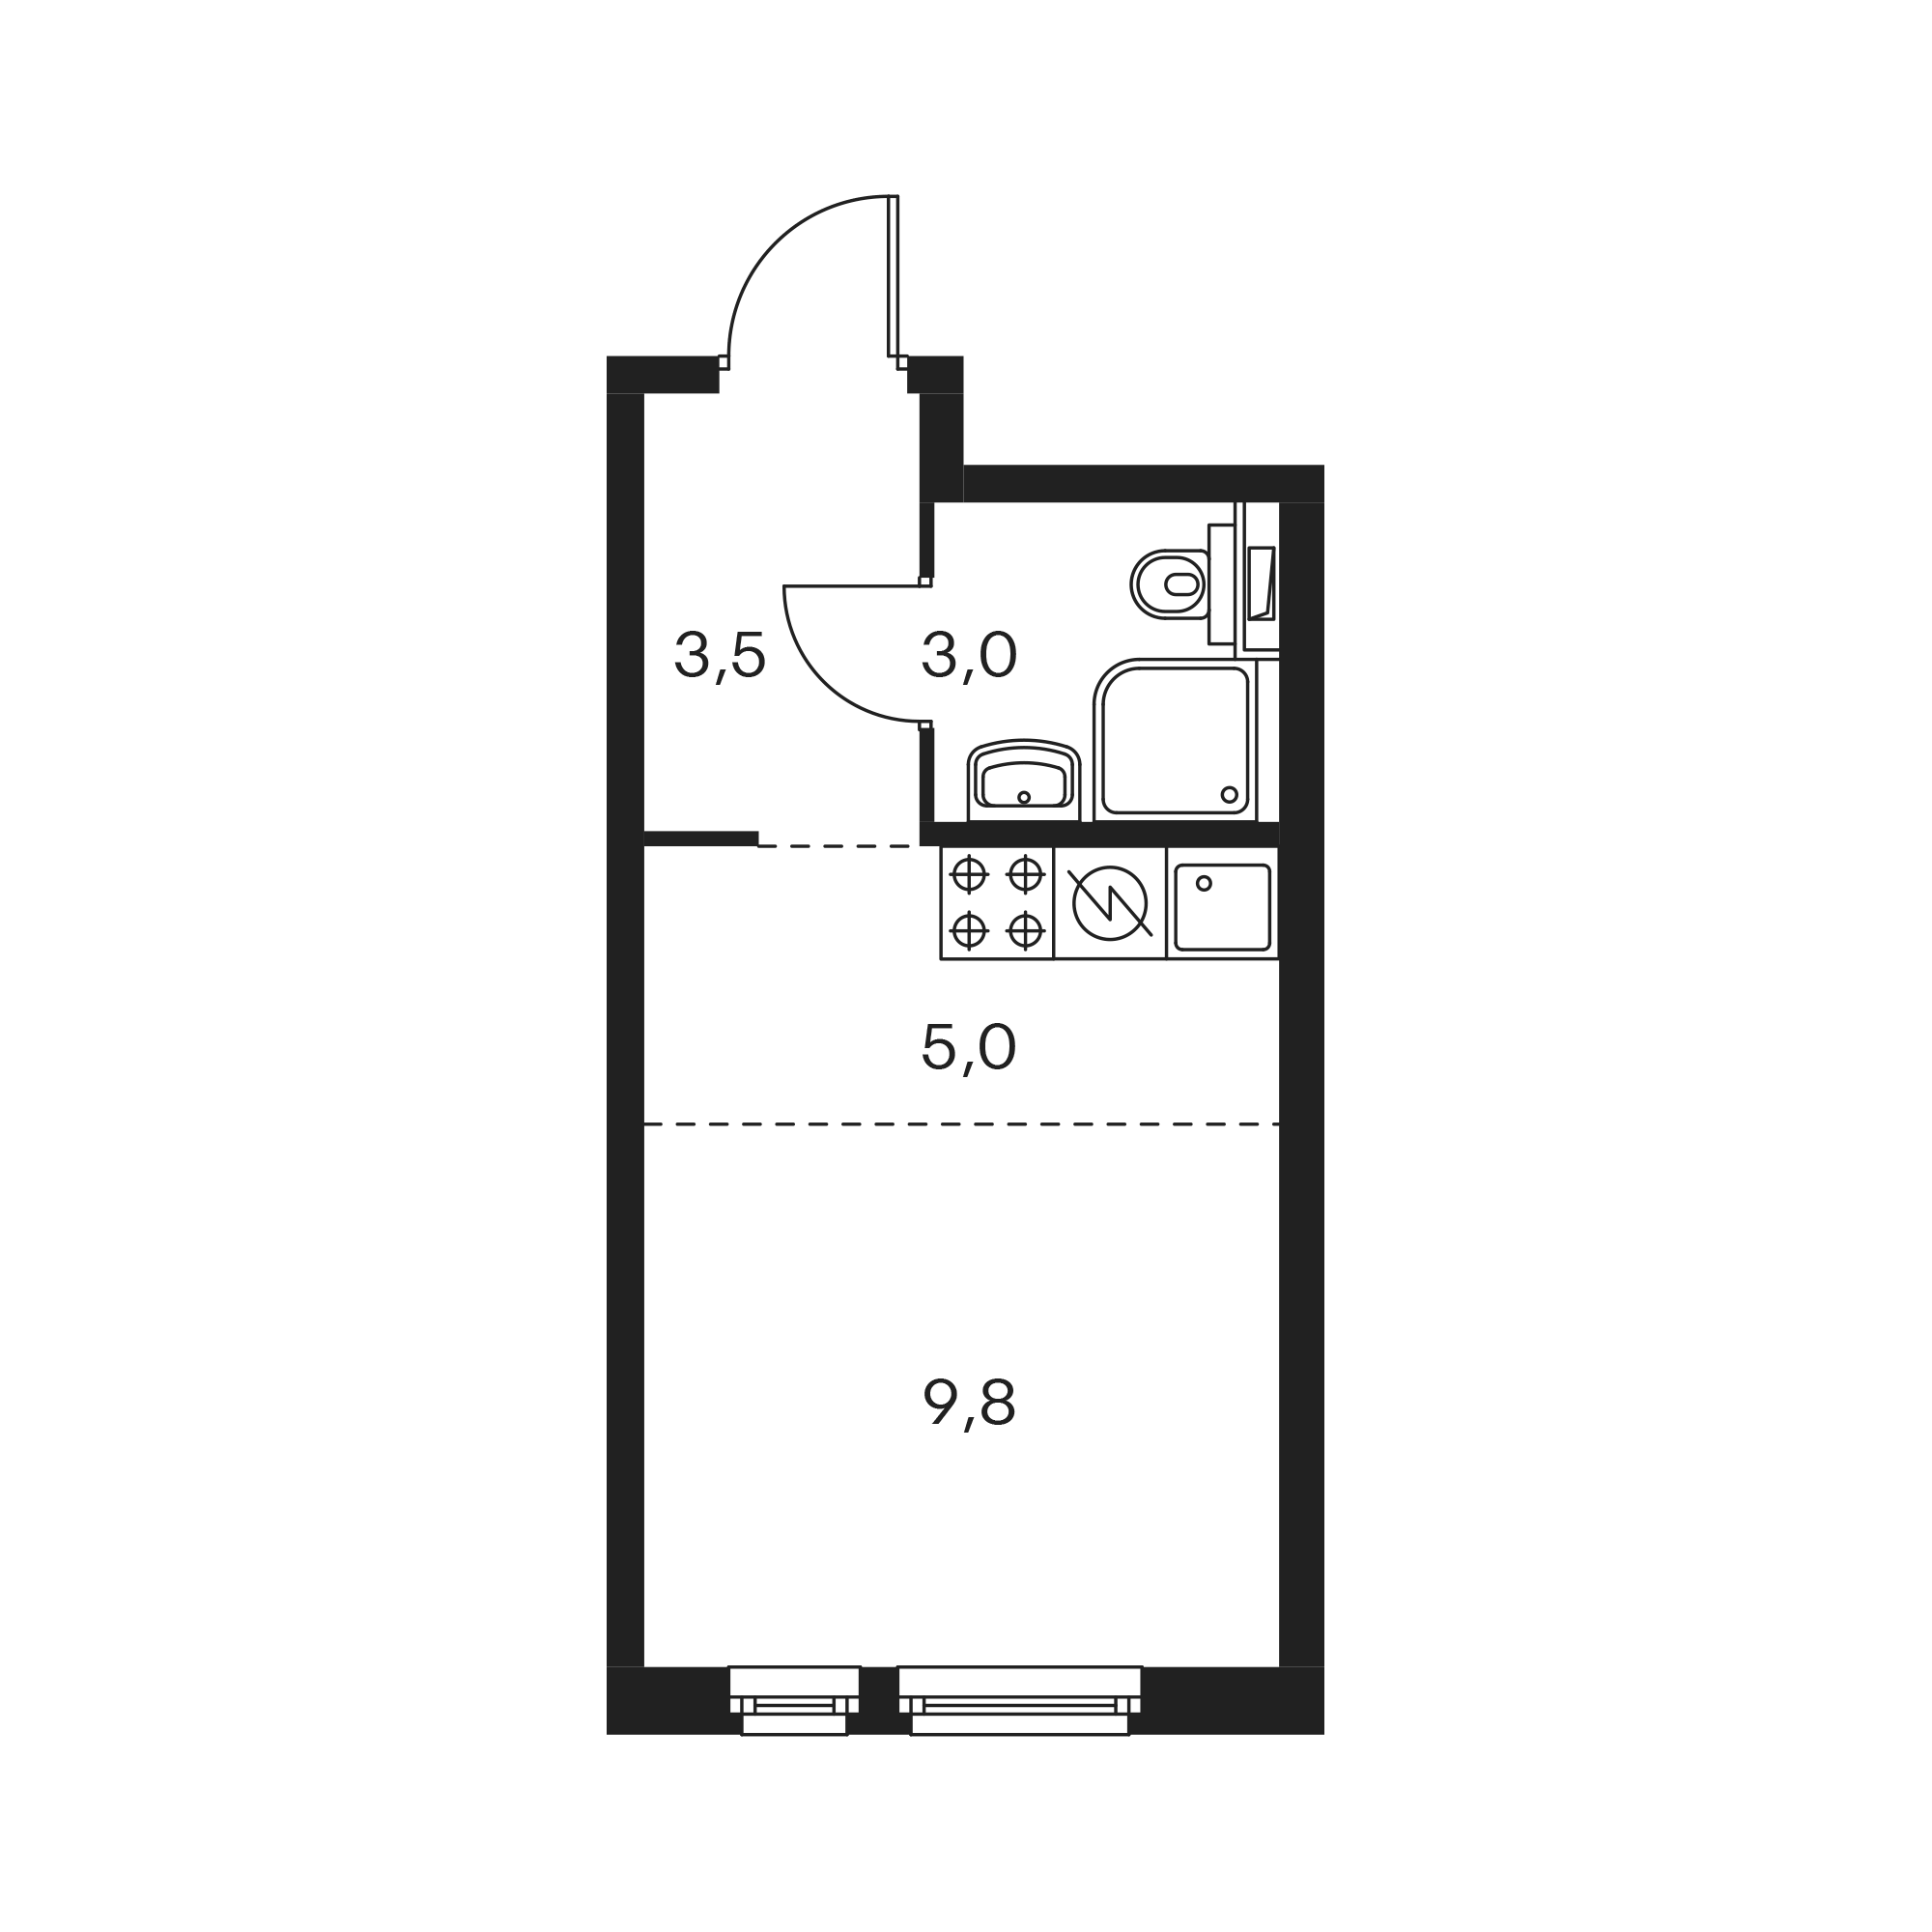 1NS1_3.6-2